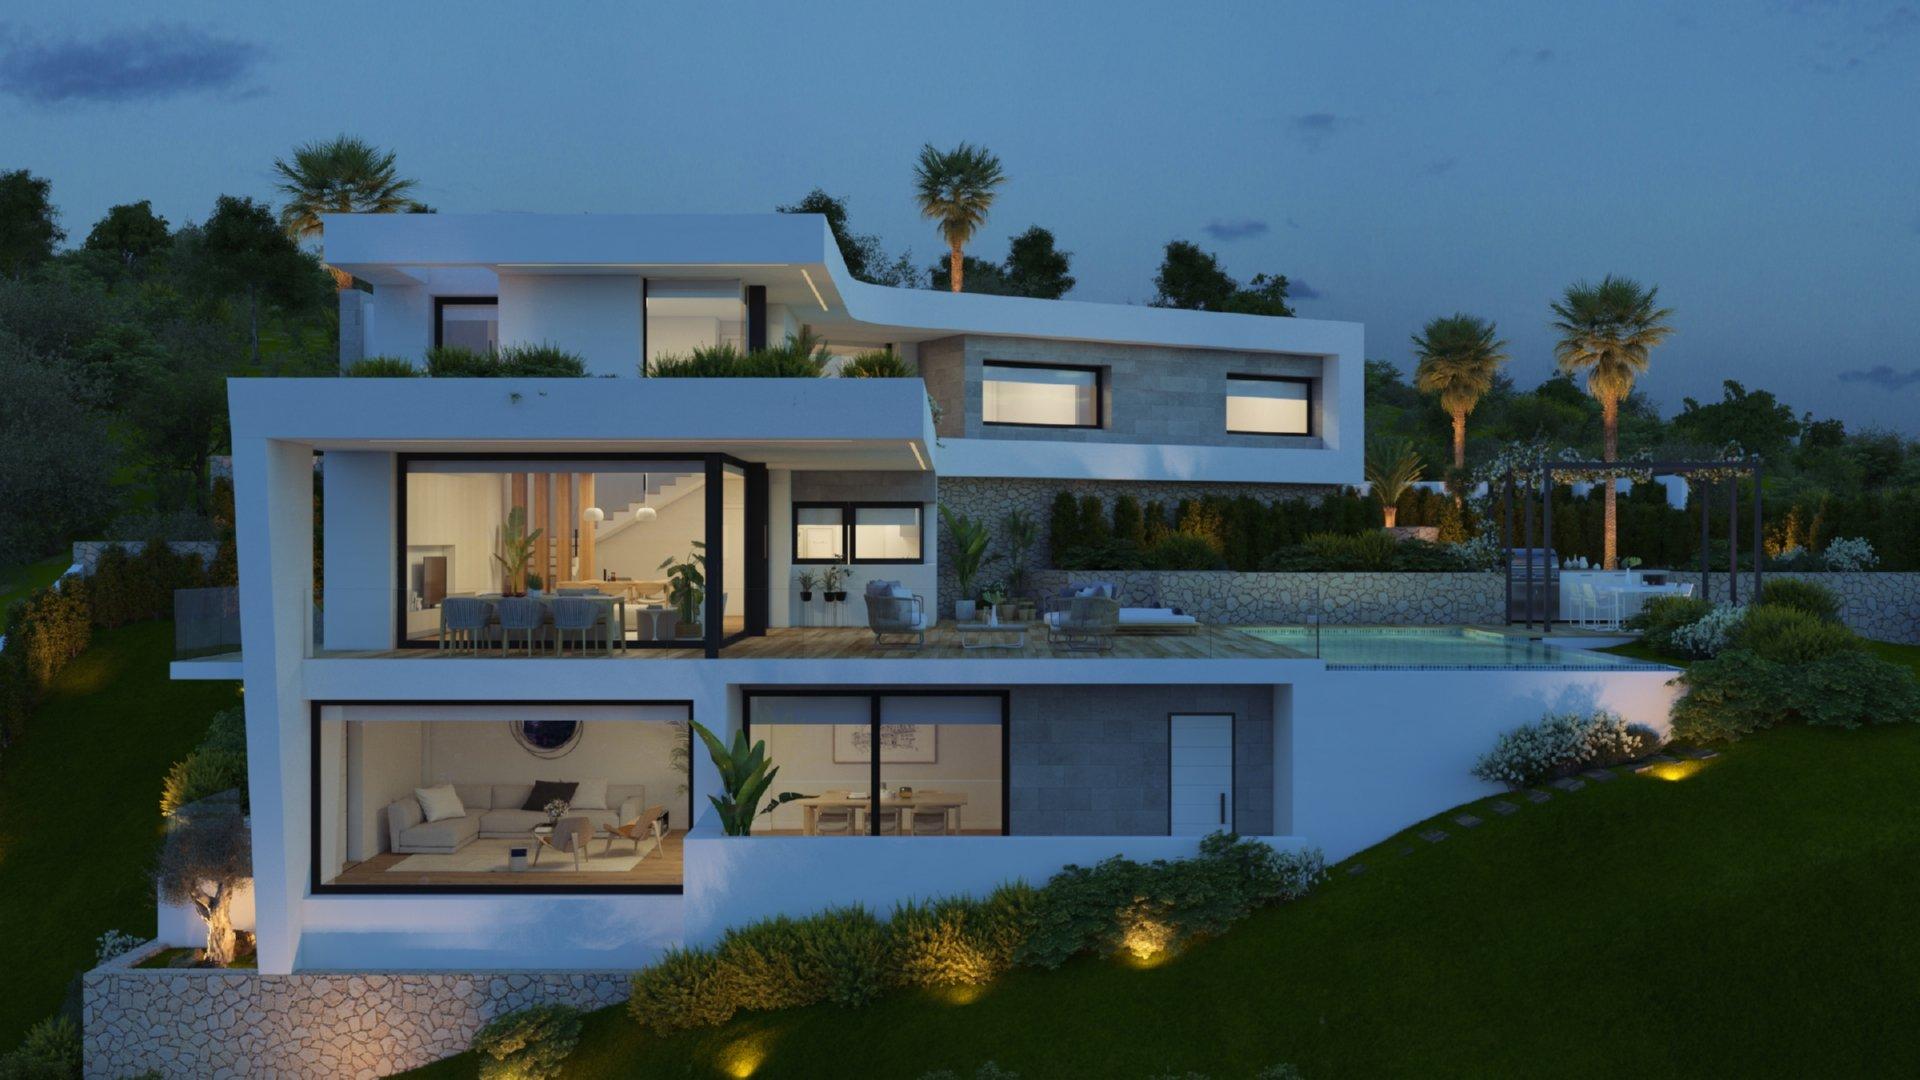 Unique villa with nice views close to amenities